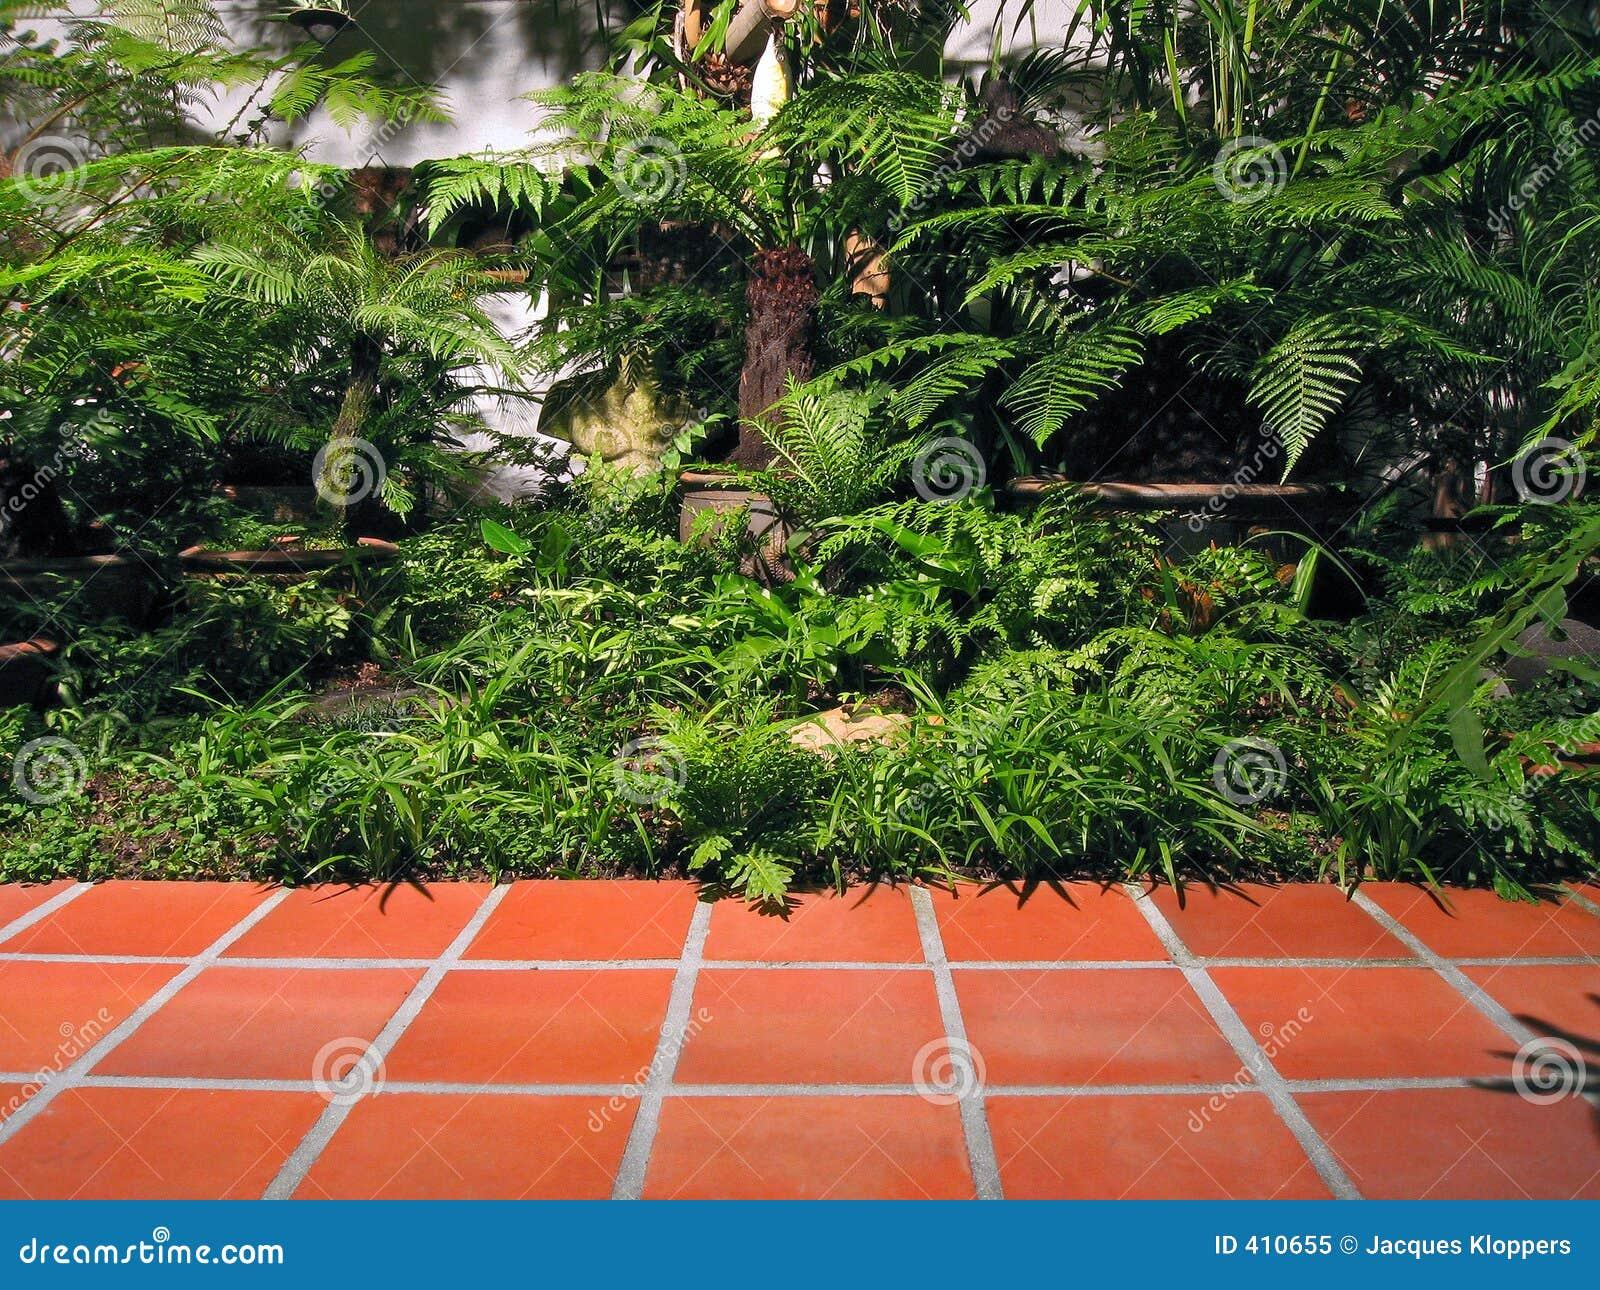 fotos de jardins urbanos : fotos de jardins urbanos:Small Tropical Gardens